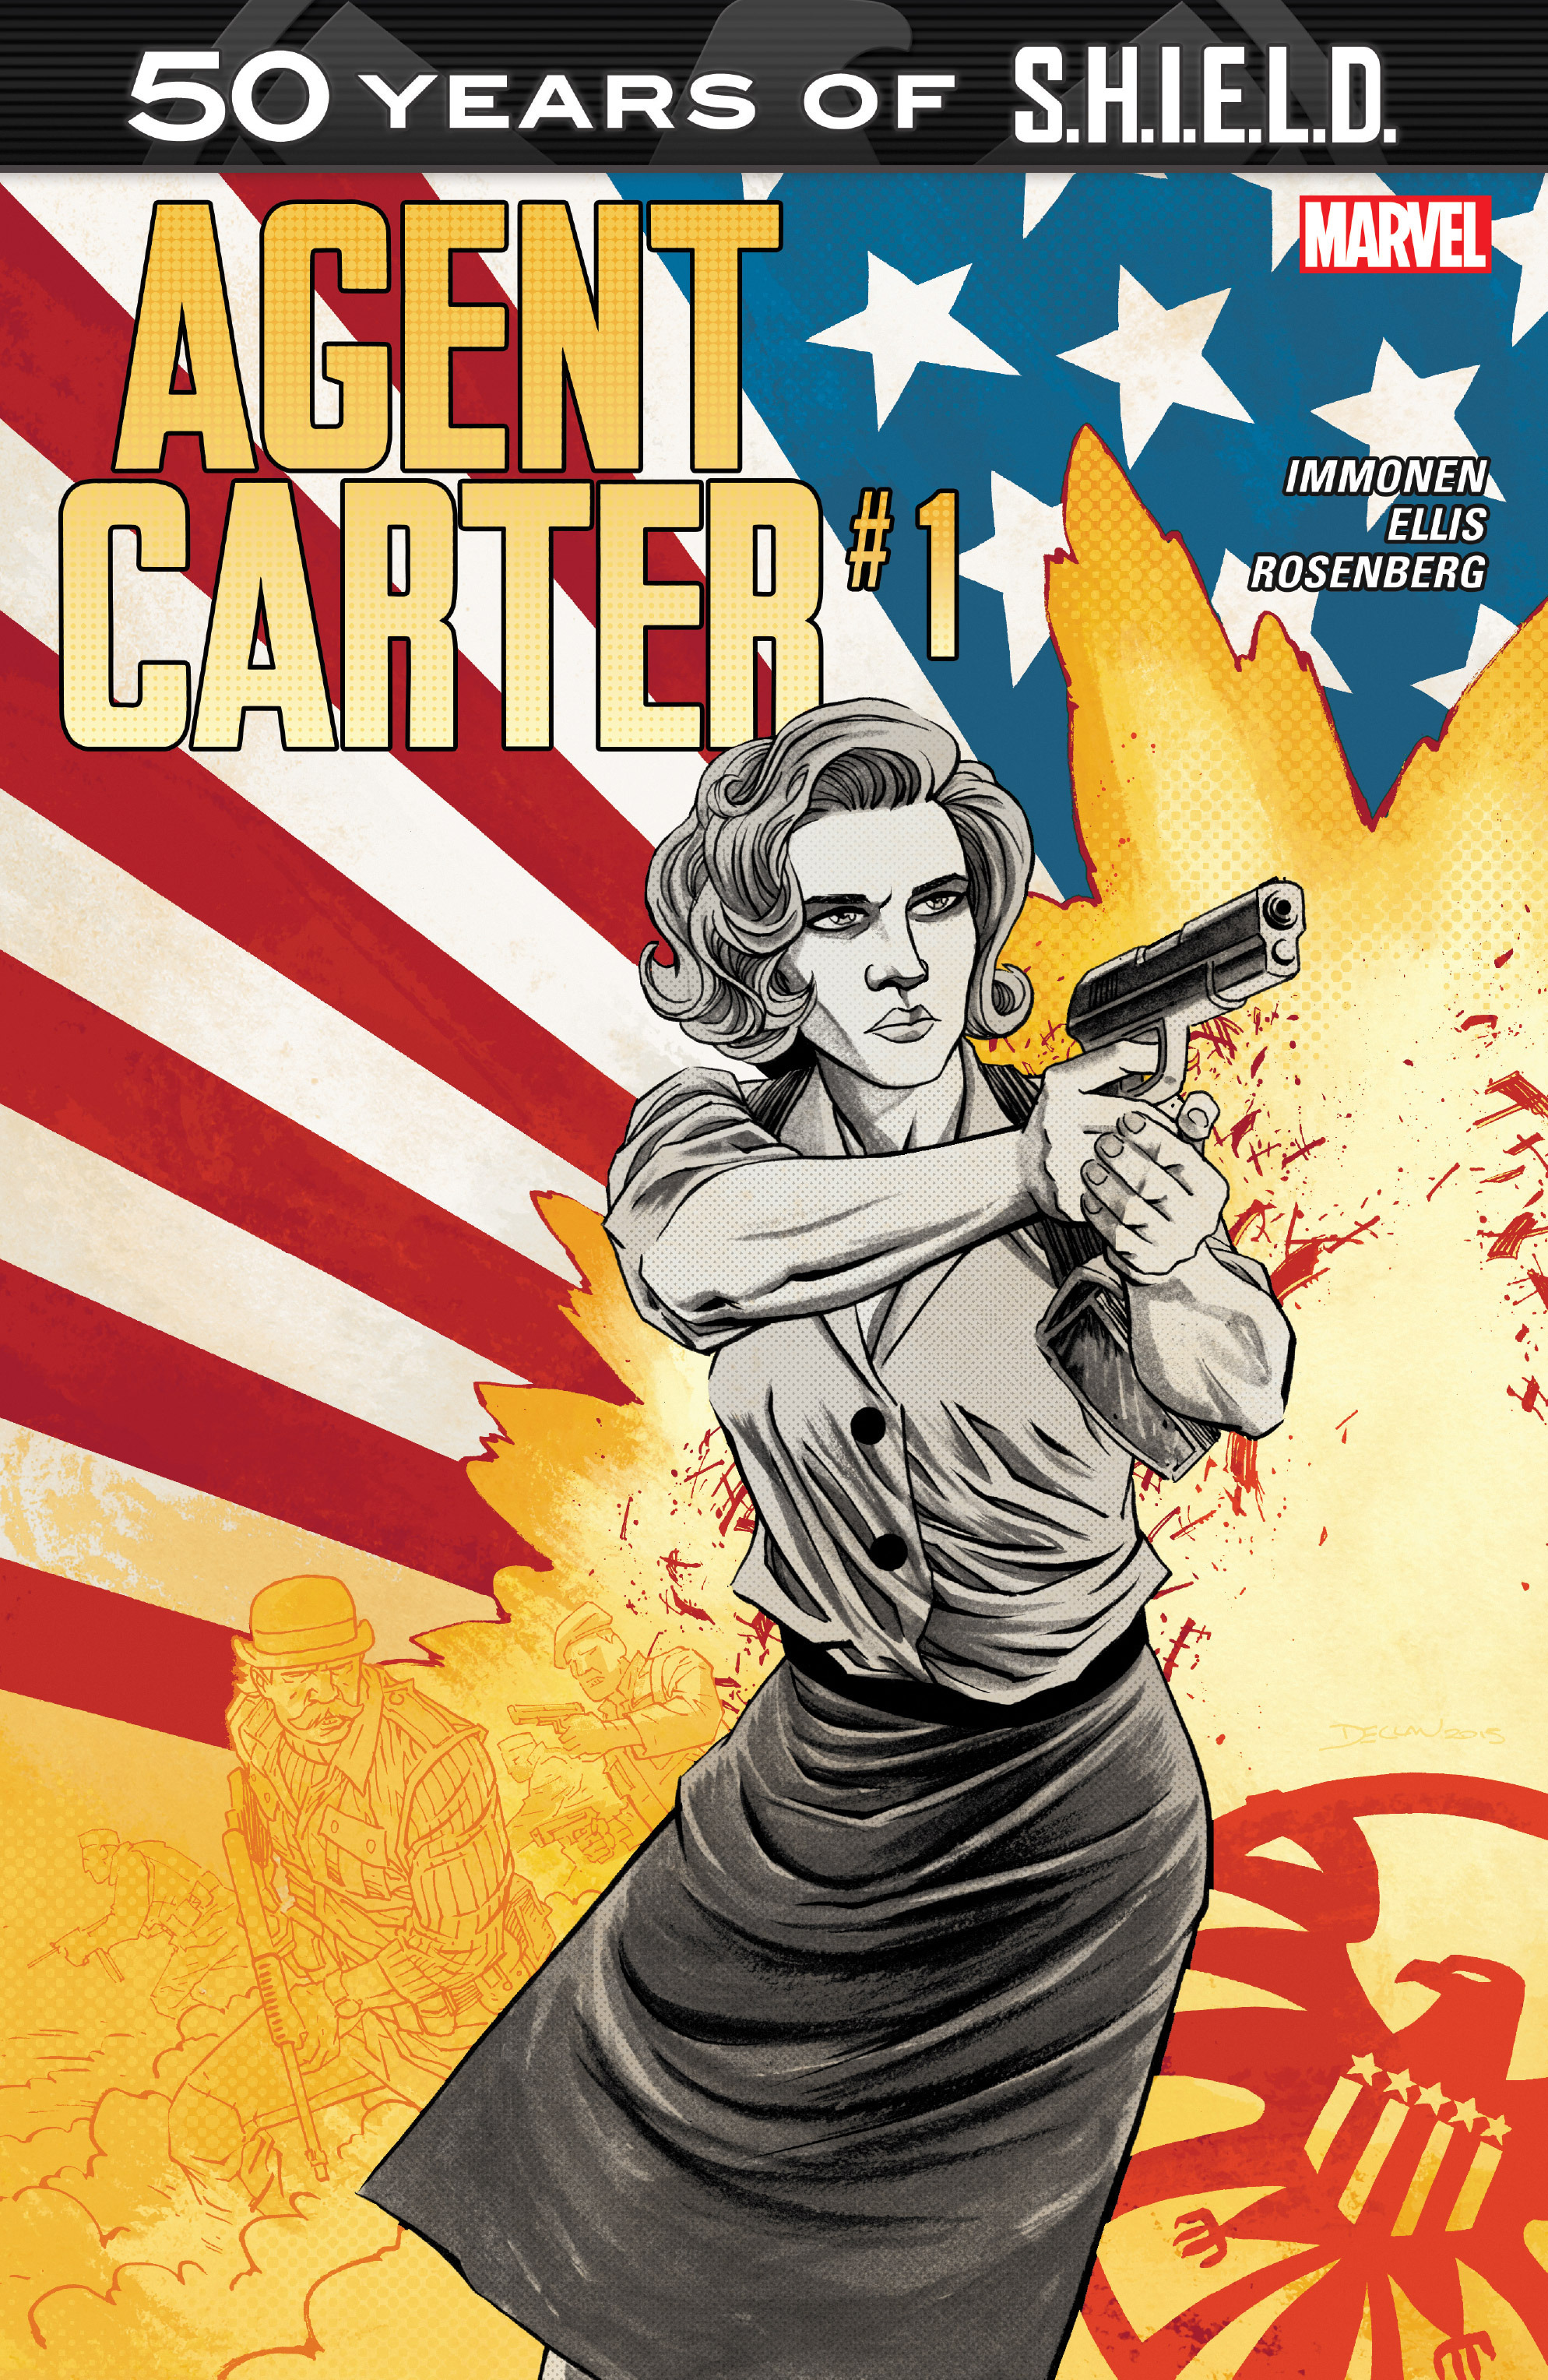 Agent Carter: S.H.I.E.L.D. 50th Anniversary Full Page 1